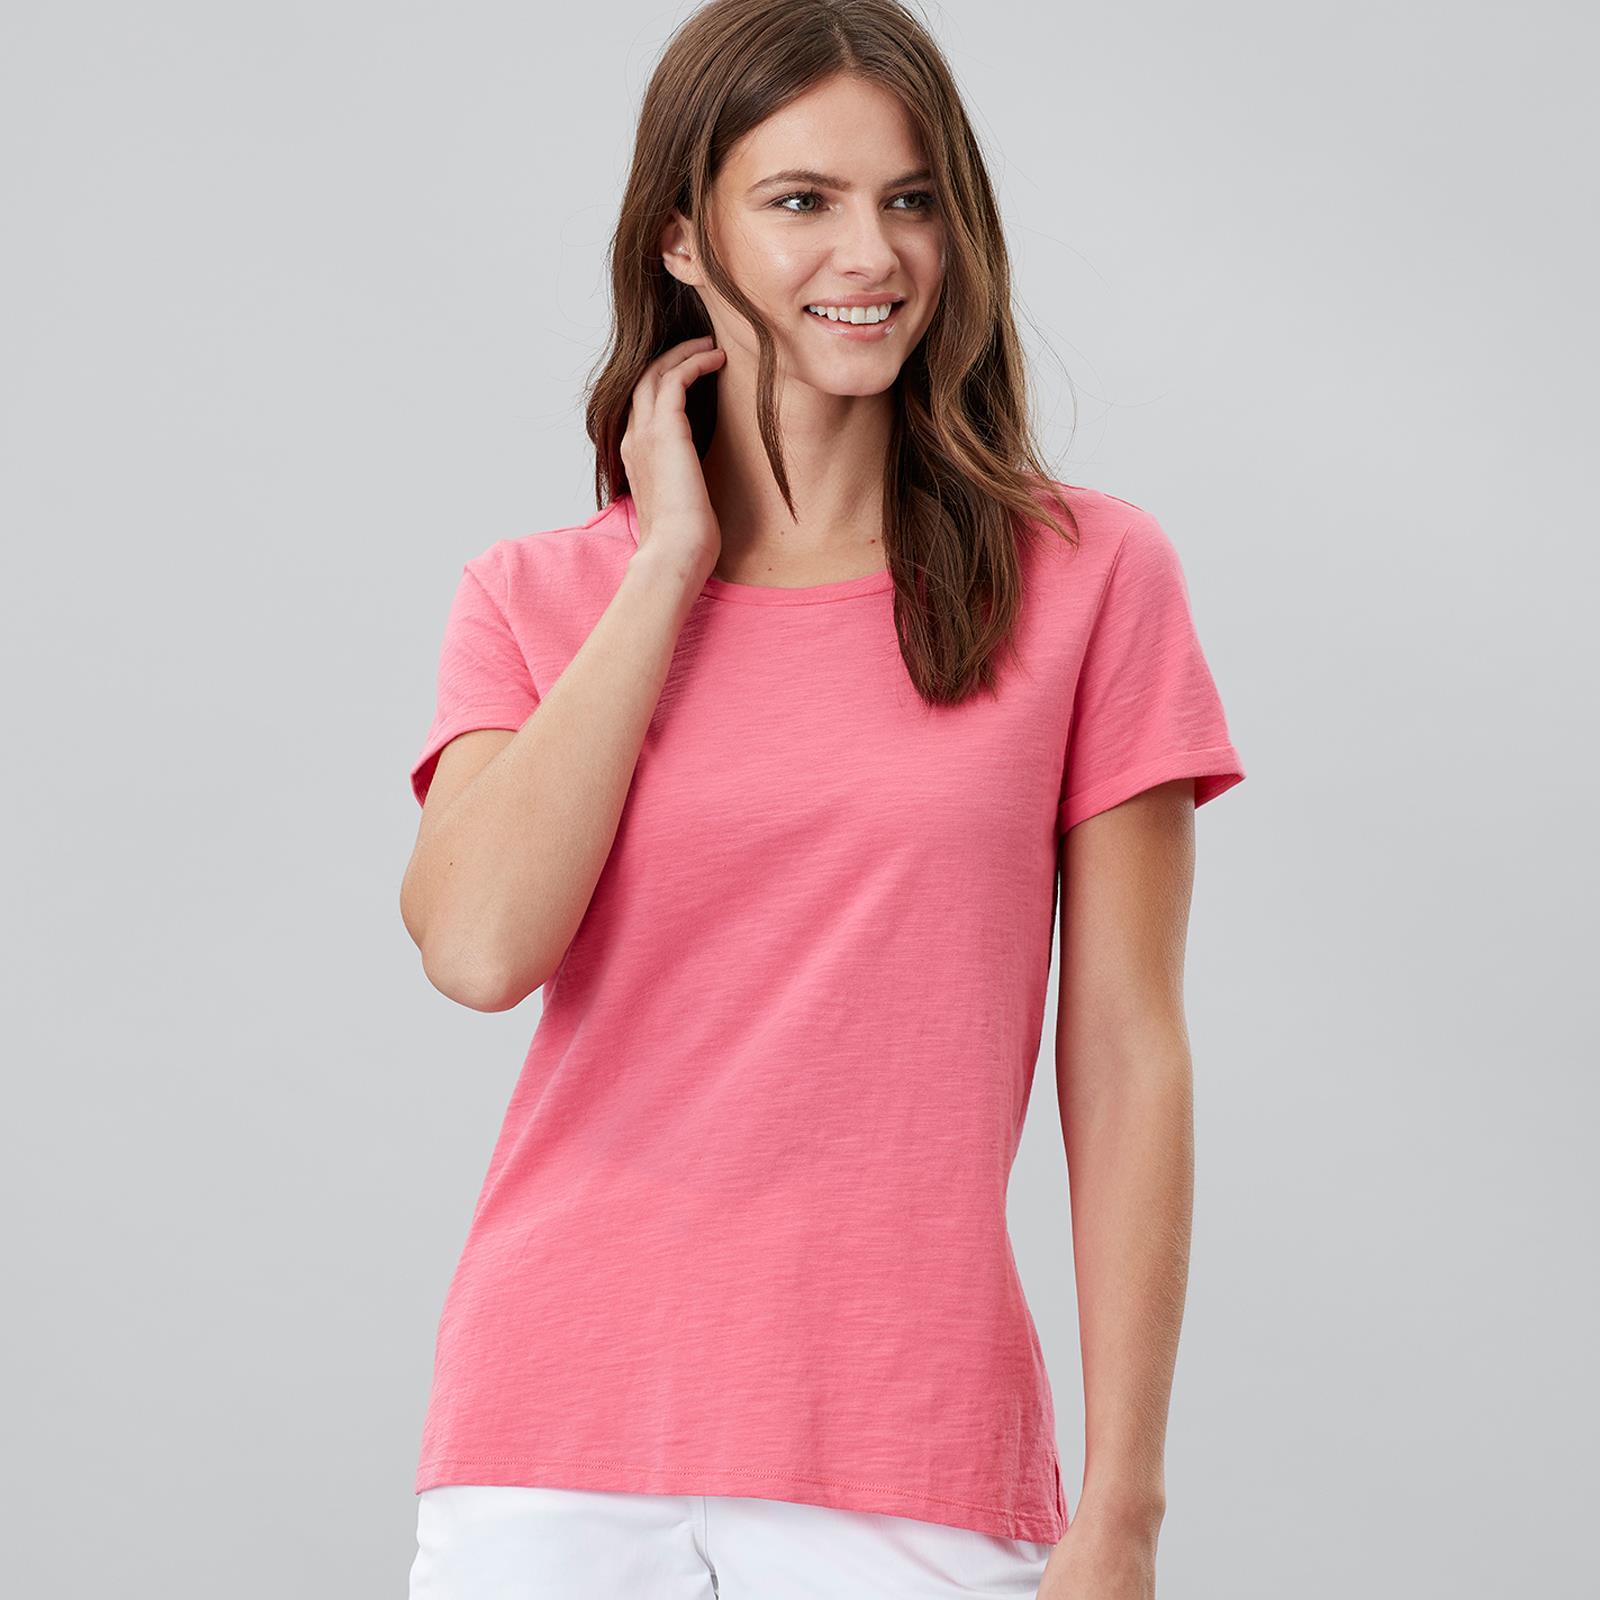 Joules-Nessa-Damas-Equitacion-Manga-corta-Jersey-Top-de-Moda-de-pais-Caminar miniatura 55